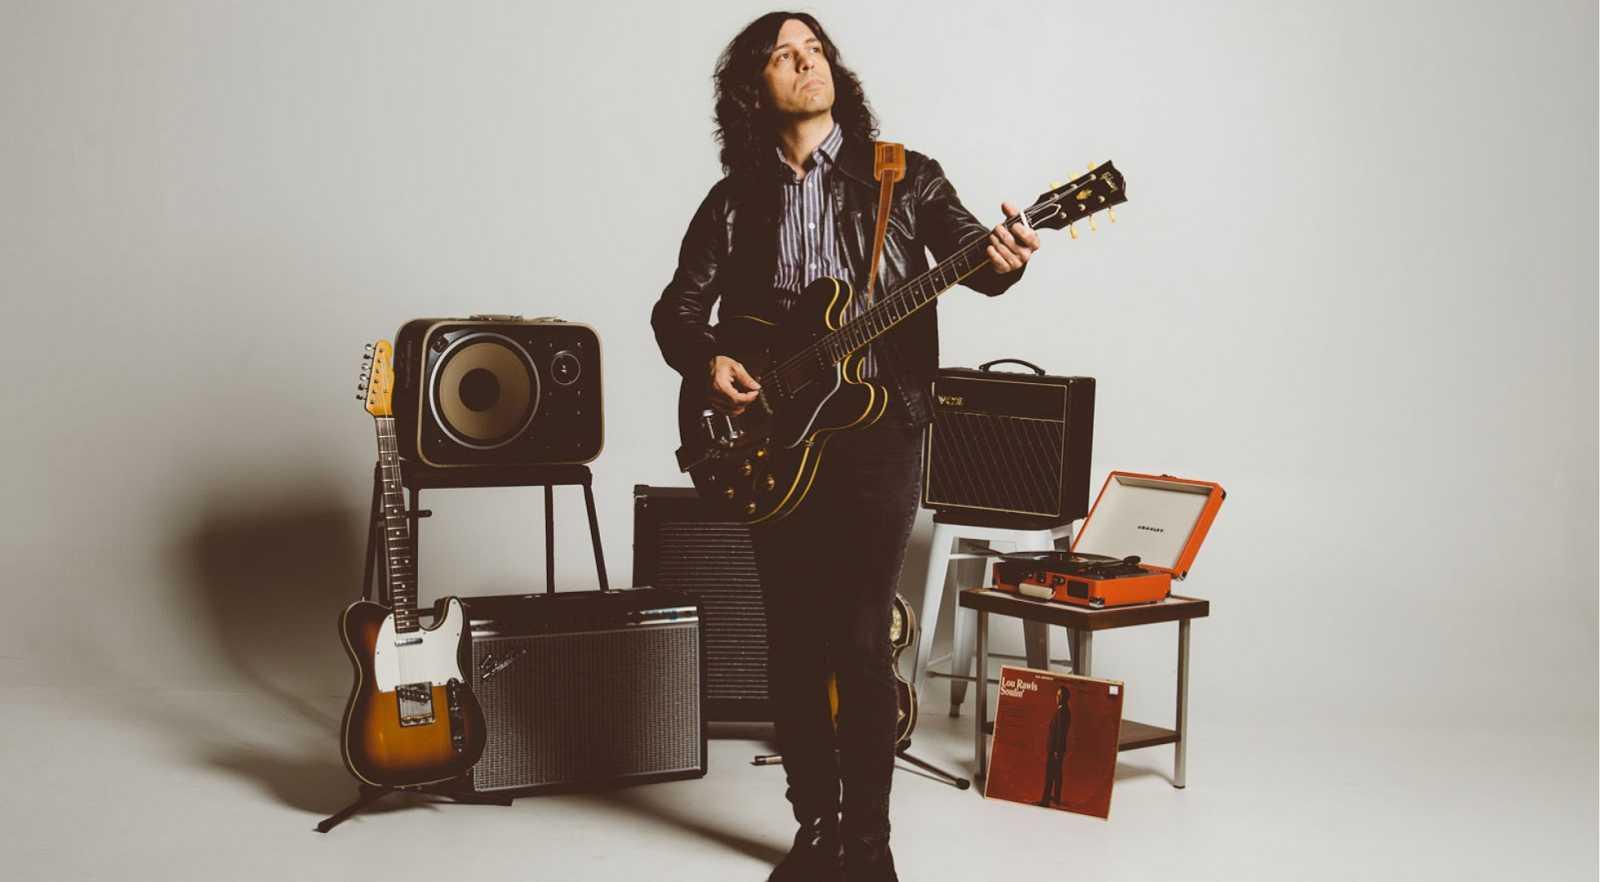 El sótano - Reno Bo, Kurt Vile, Bob Dylan, Dream Syndicate, Kurt Baker... - 22/10/20 - escuchar ahora